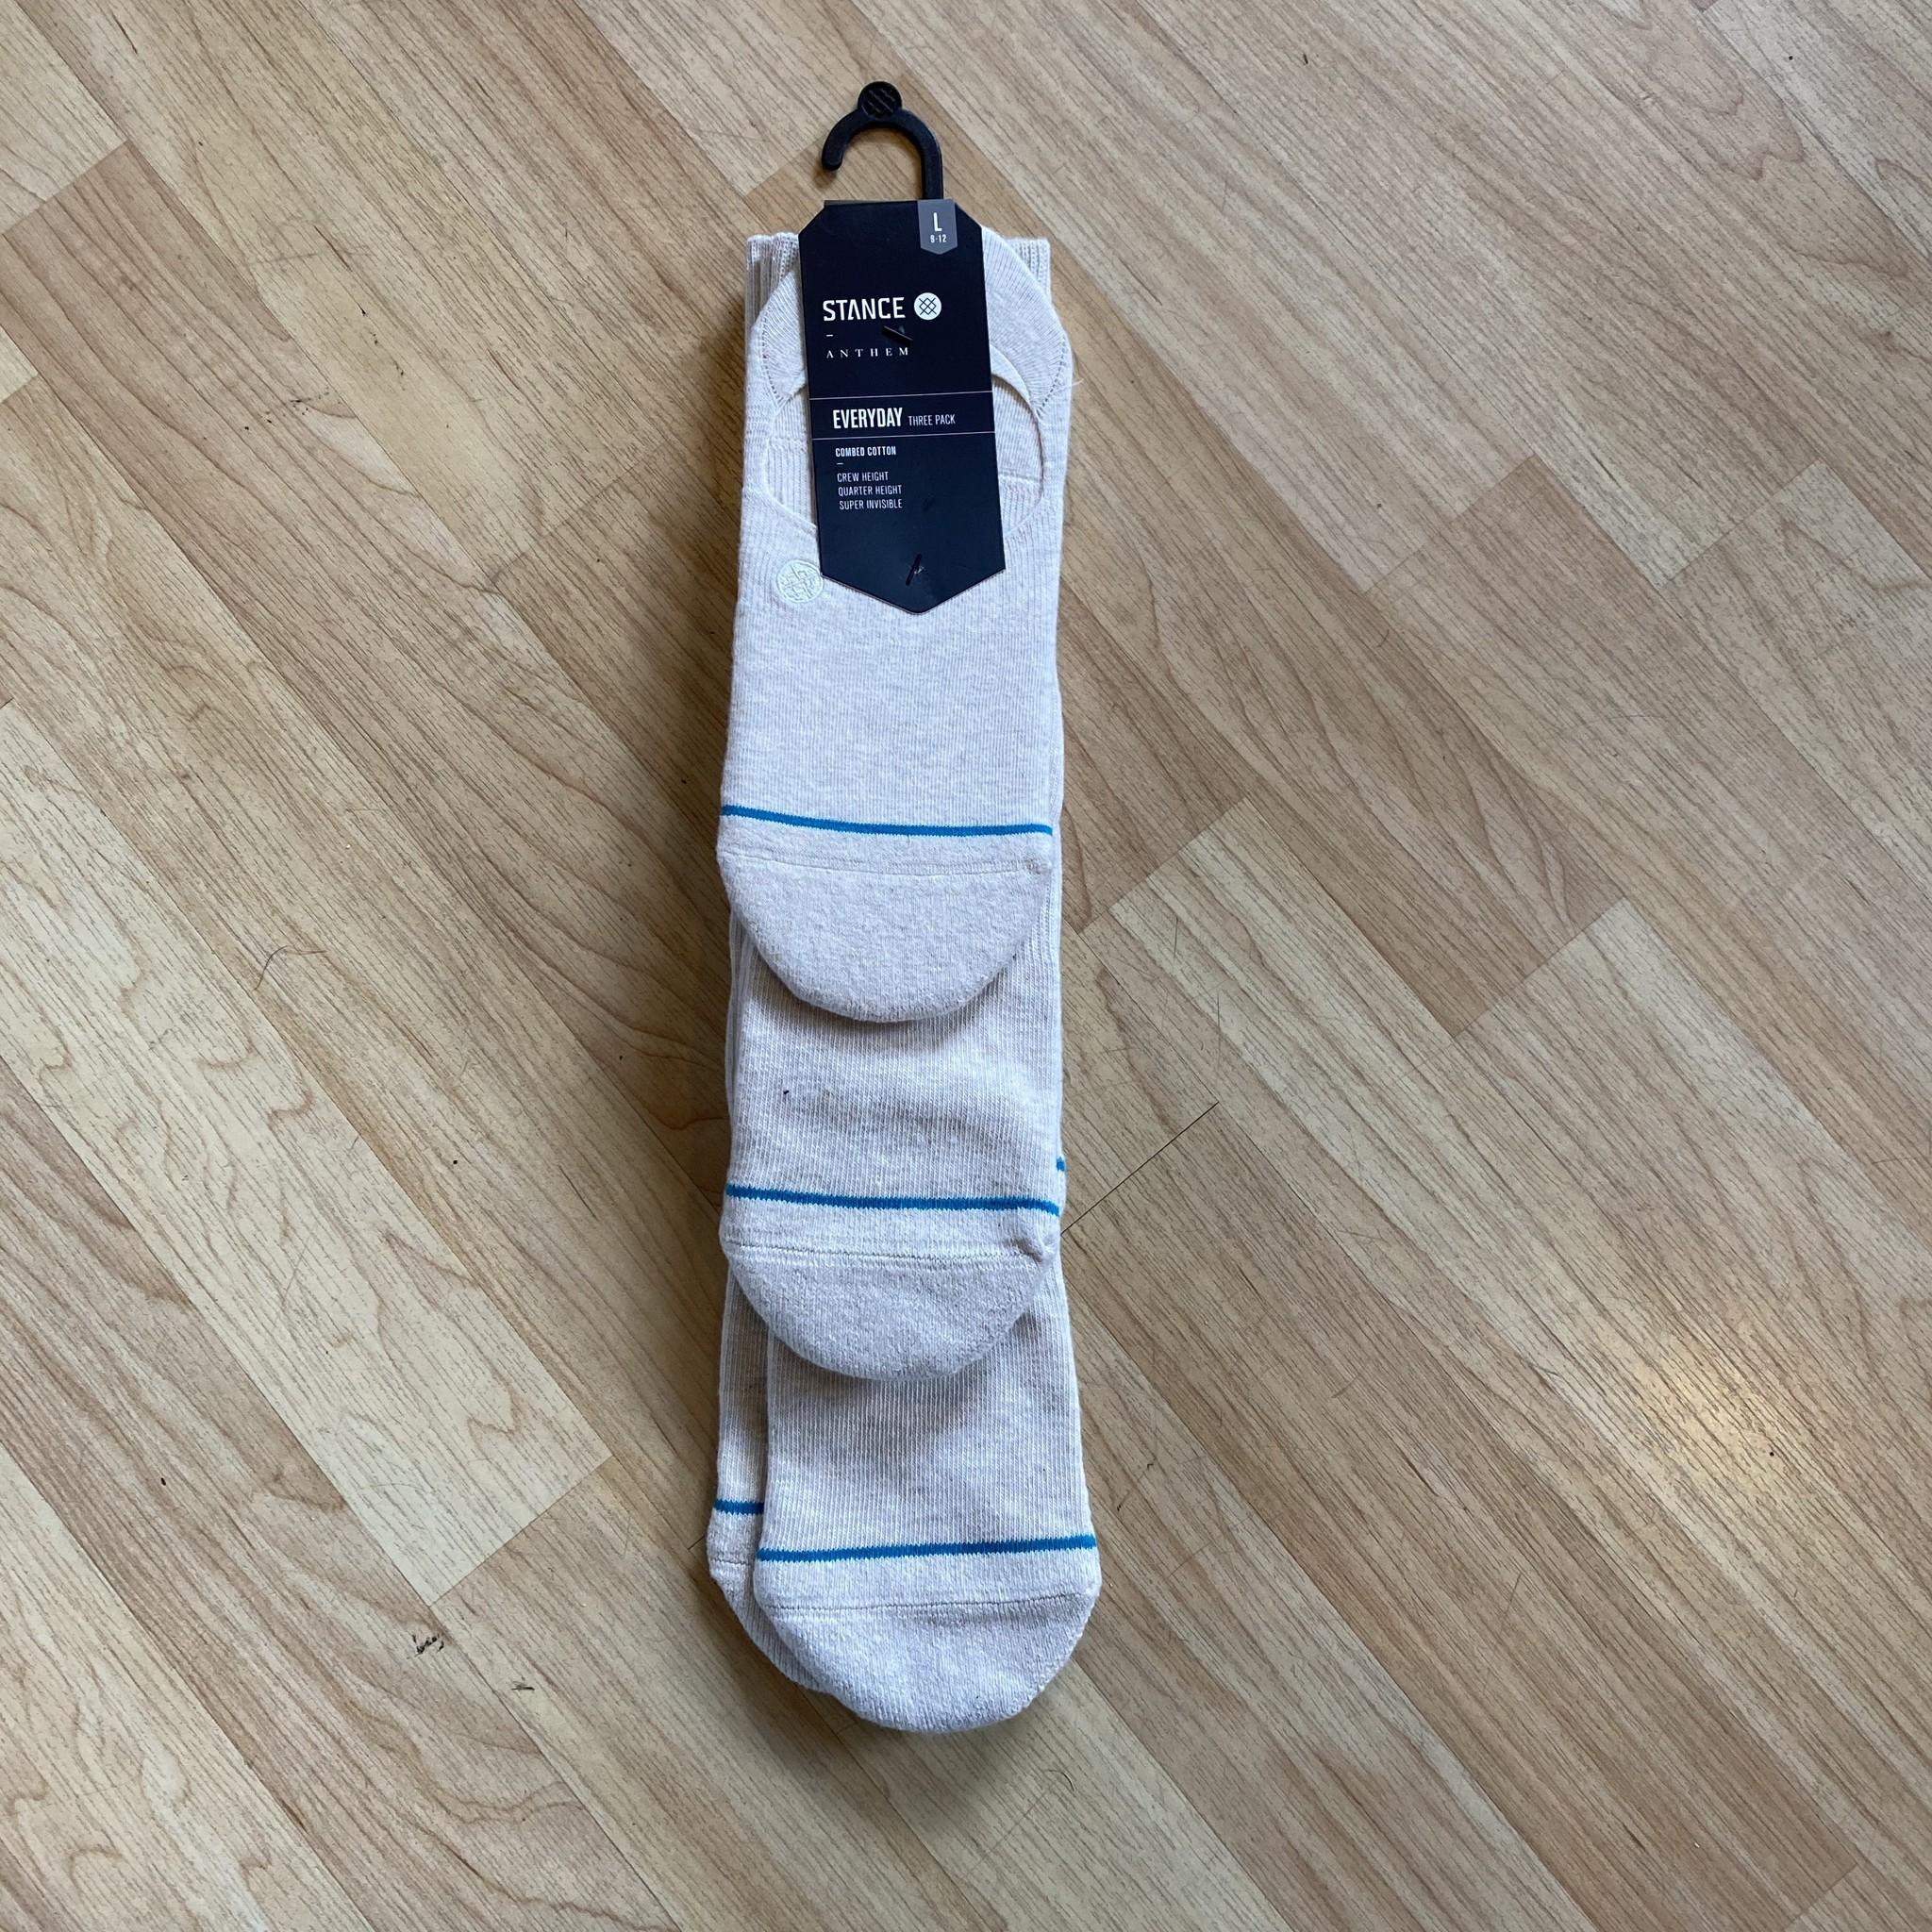 Stance Socks Gamut 3 Pack Natural Large